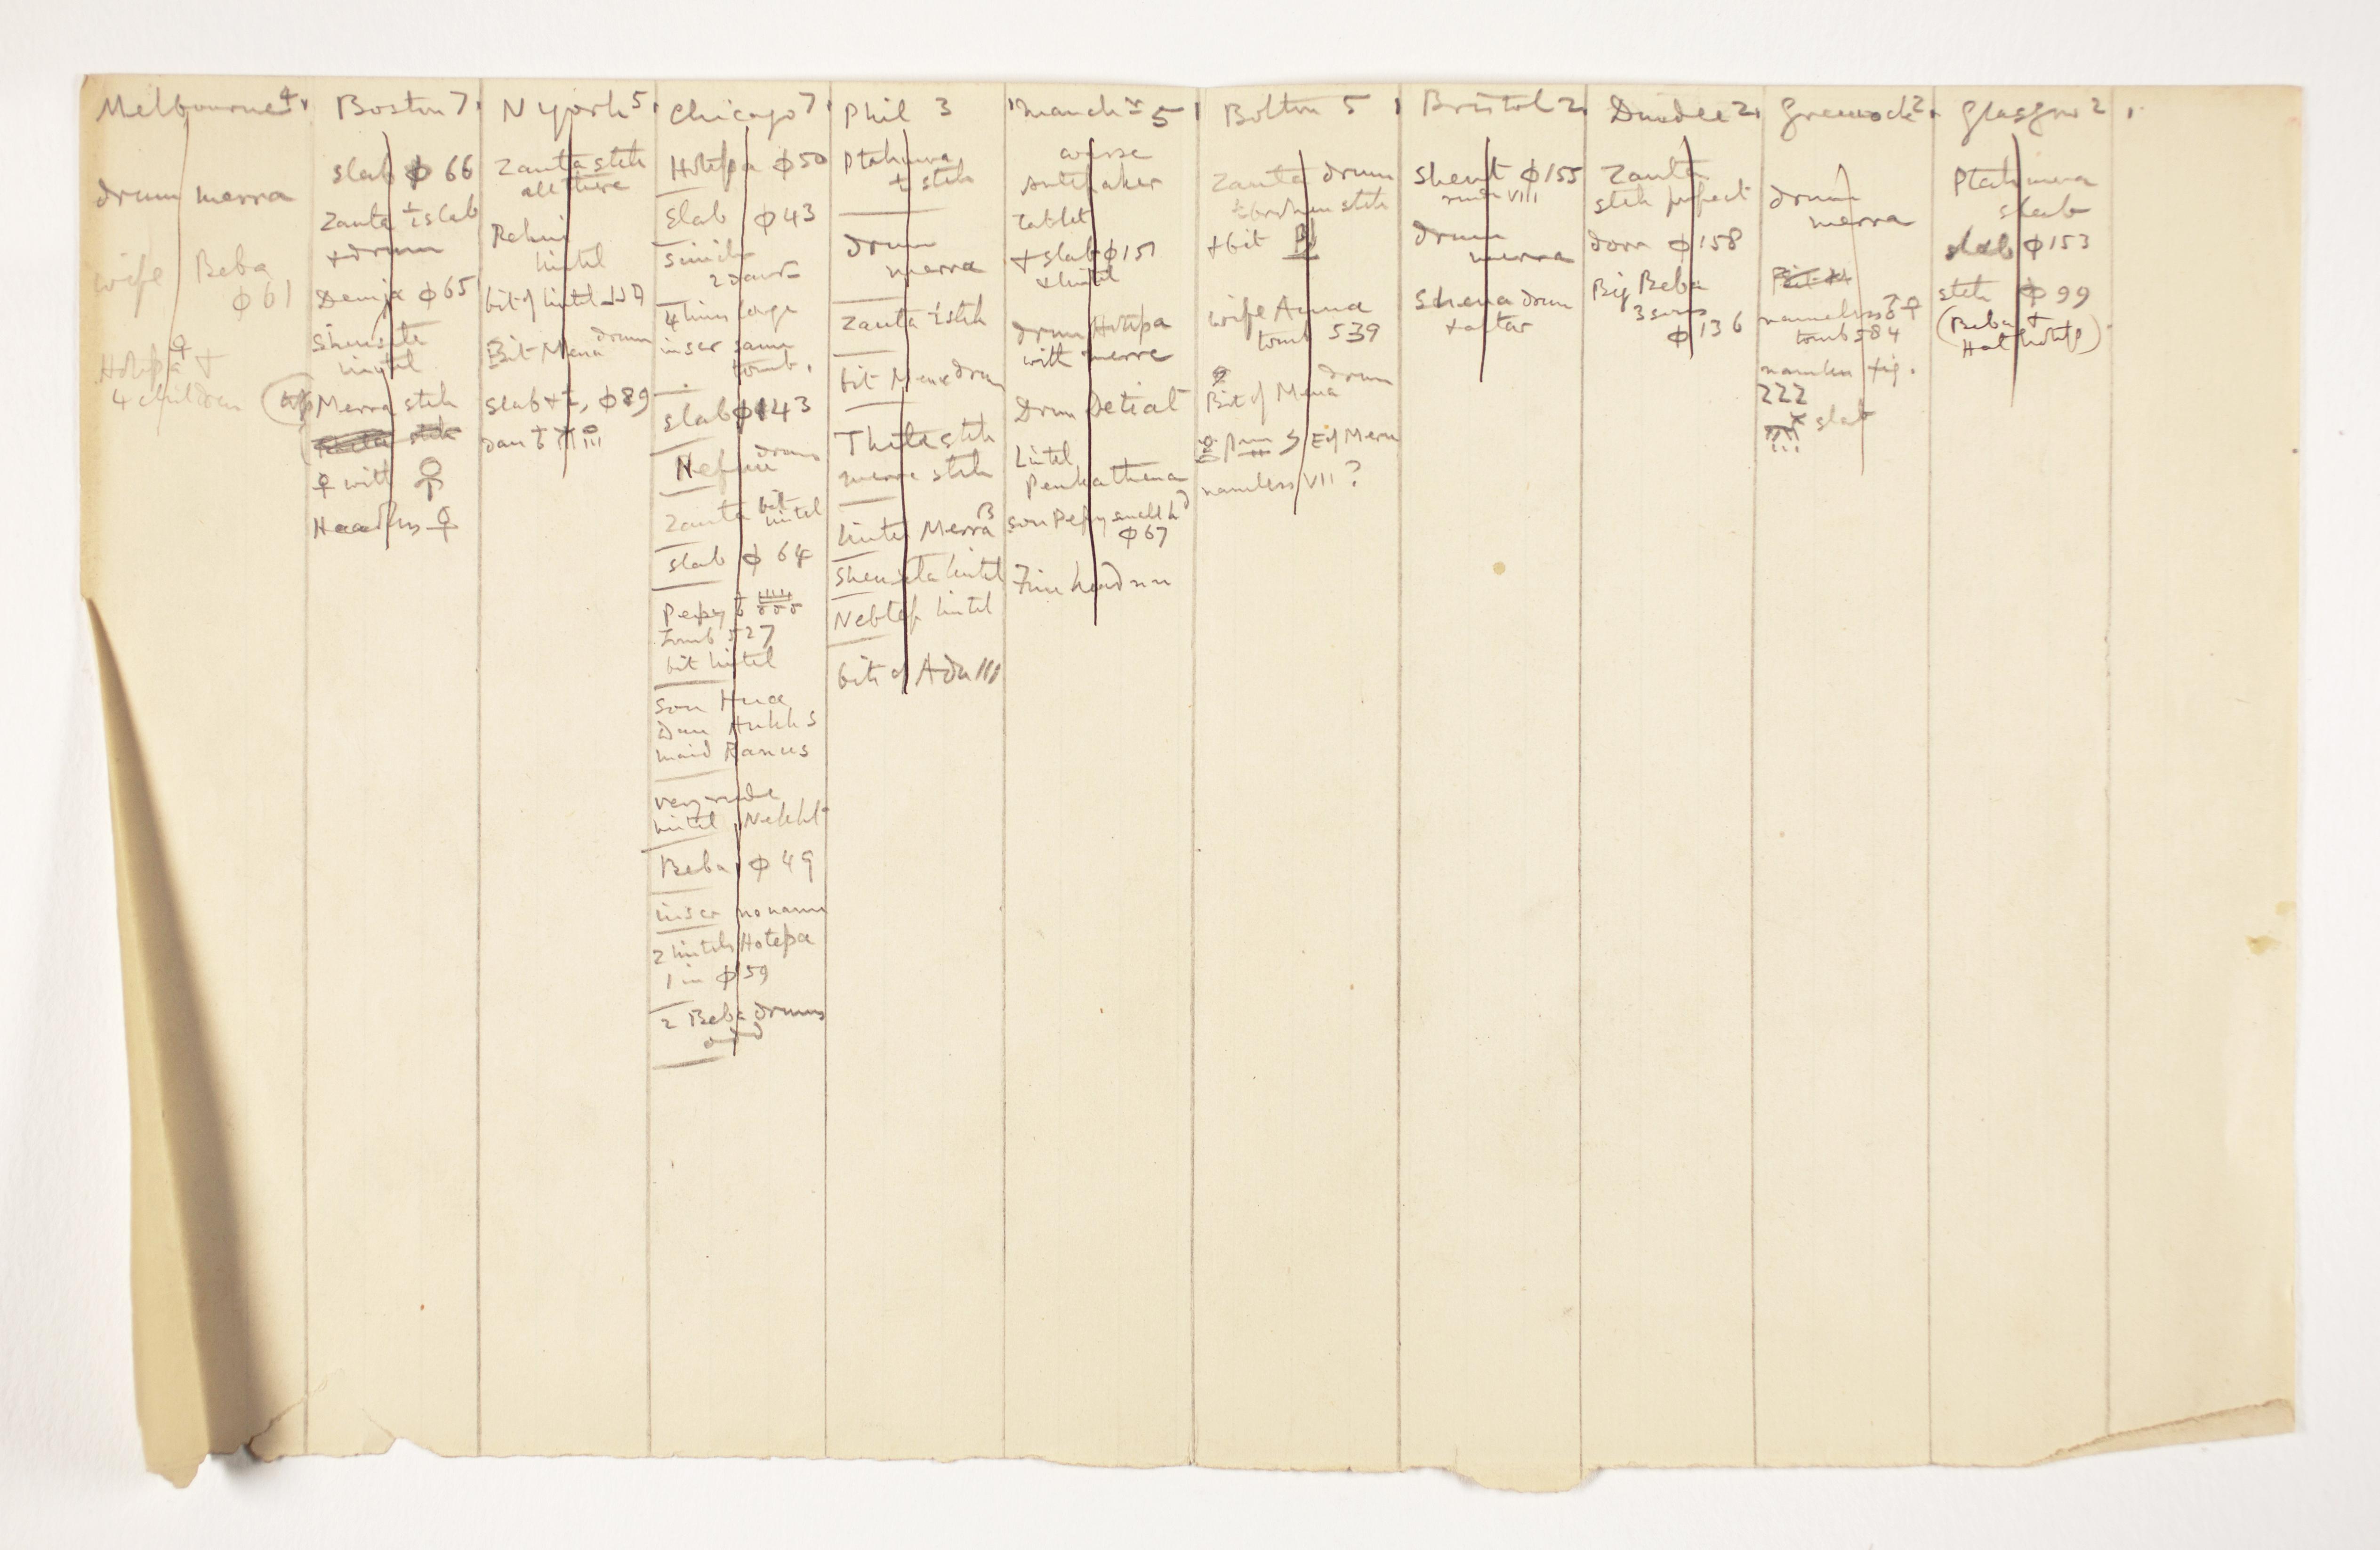 1897-98 Dendara, Hierakonpolis Multiple institution list PMA/WFP1/D/6/2.2